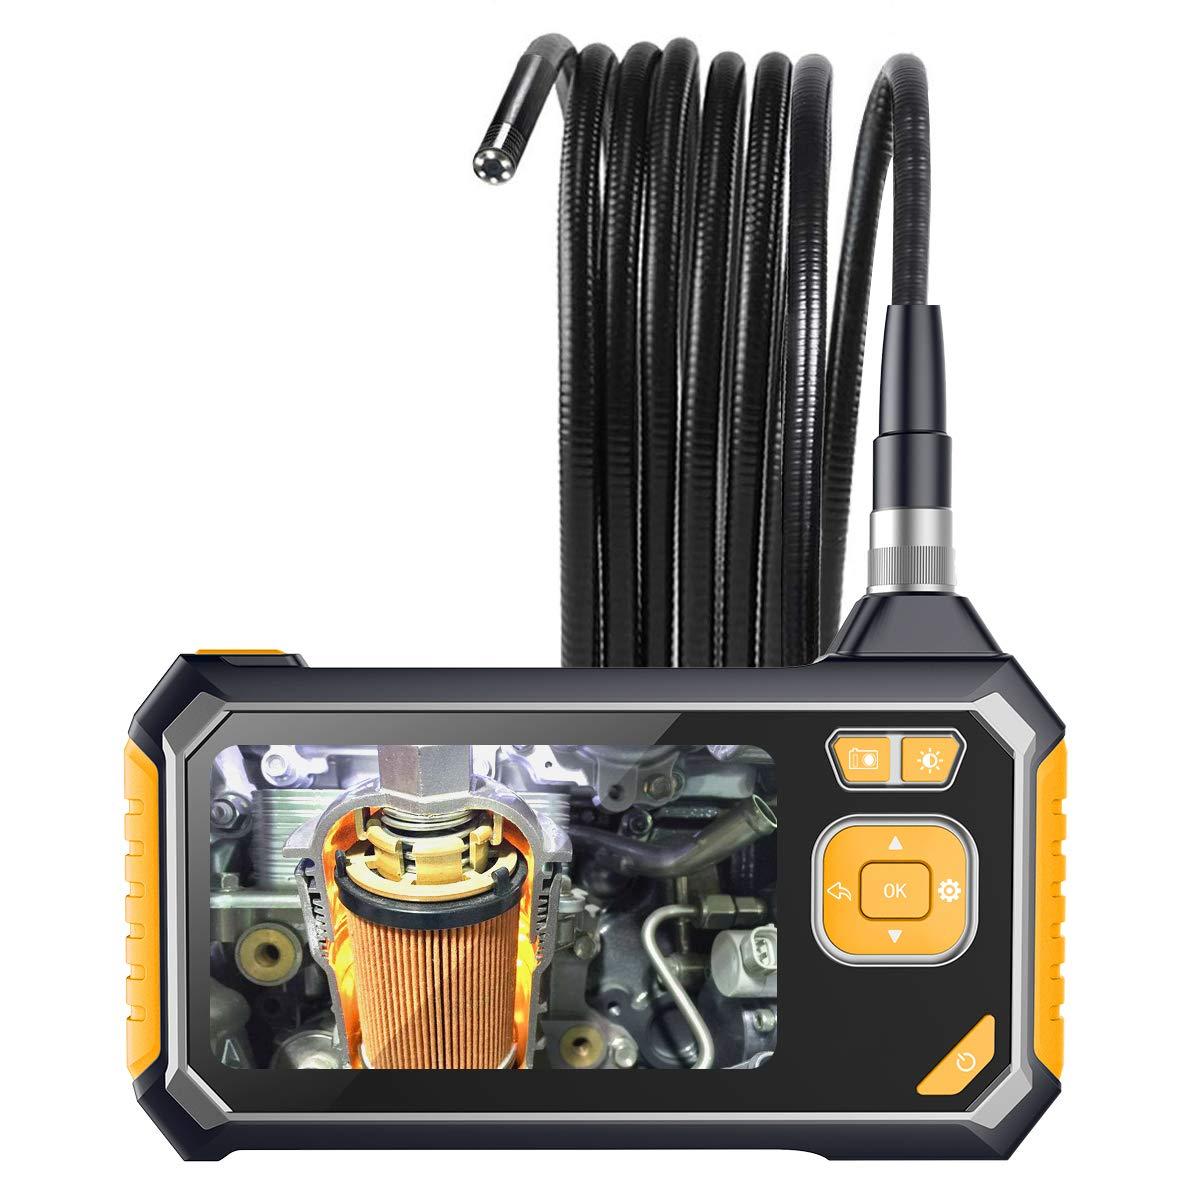 YINAMA Industrial Endoscope